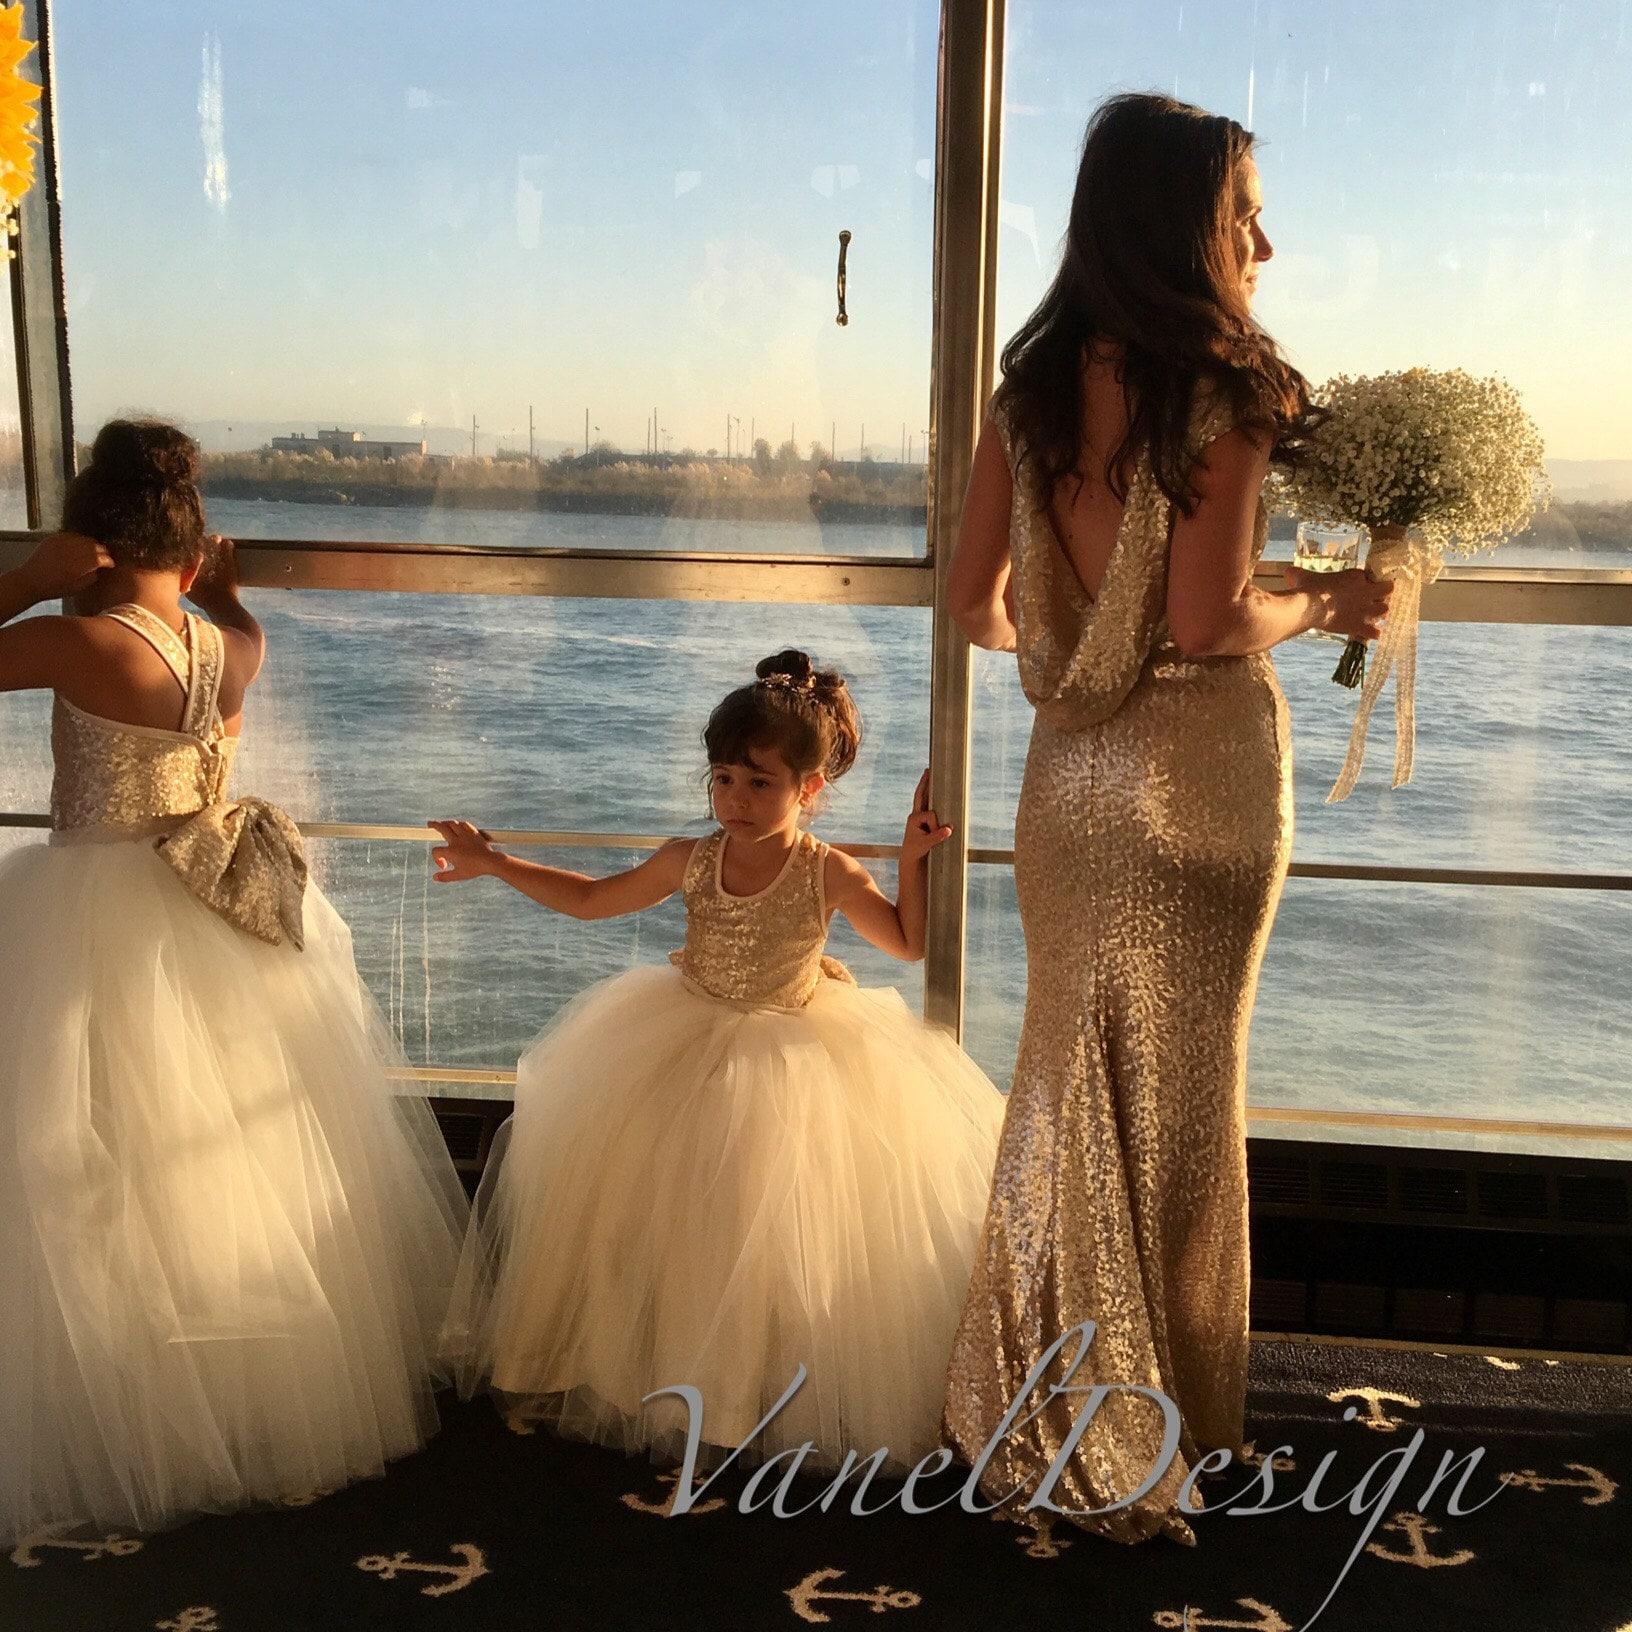 Wedding Dress Bridesmaid Dress Flowergirl Dress di VanelDesign 17d9a0a8c8c